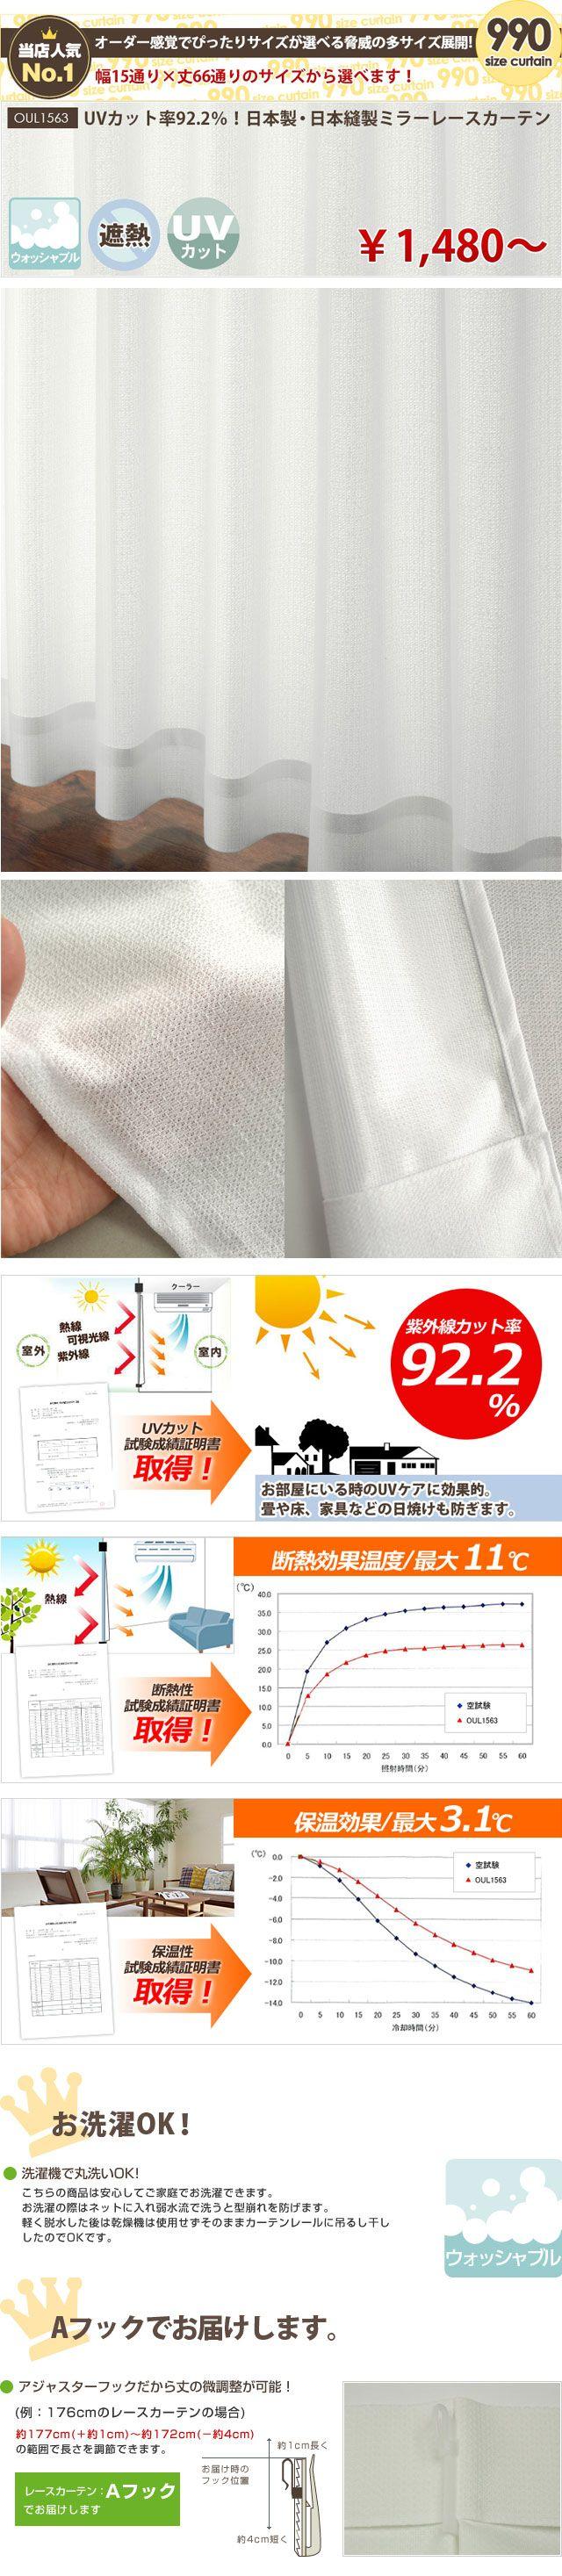 UVカット・断熱性・保温性を保持!。【990サイズ】【OUL1563】【日本製生地&国内縫製品】UVカット92.2%!ミラーレースカーテン ワイズレース 幅70−100cmx丈68−107cm 1枚 [紫外線カット 断熱性 保温性 日本縫製 見えにくい 多サイズ Made in Japan]